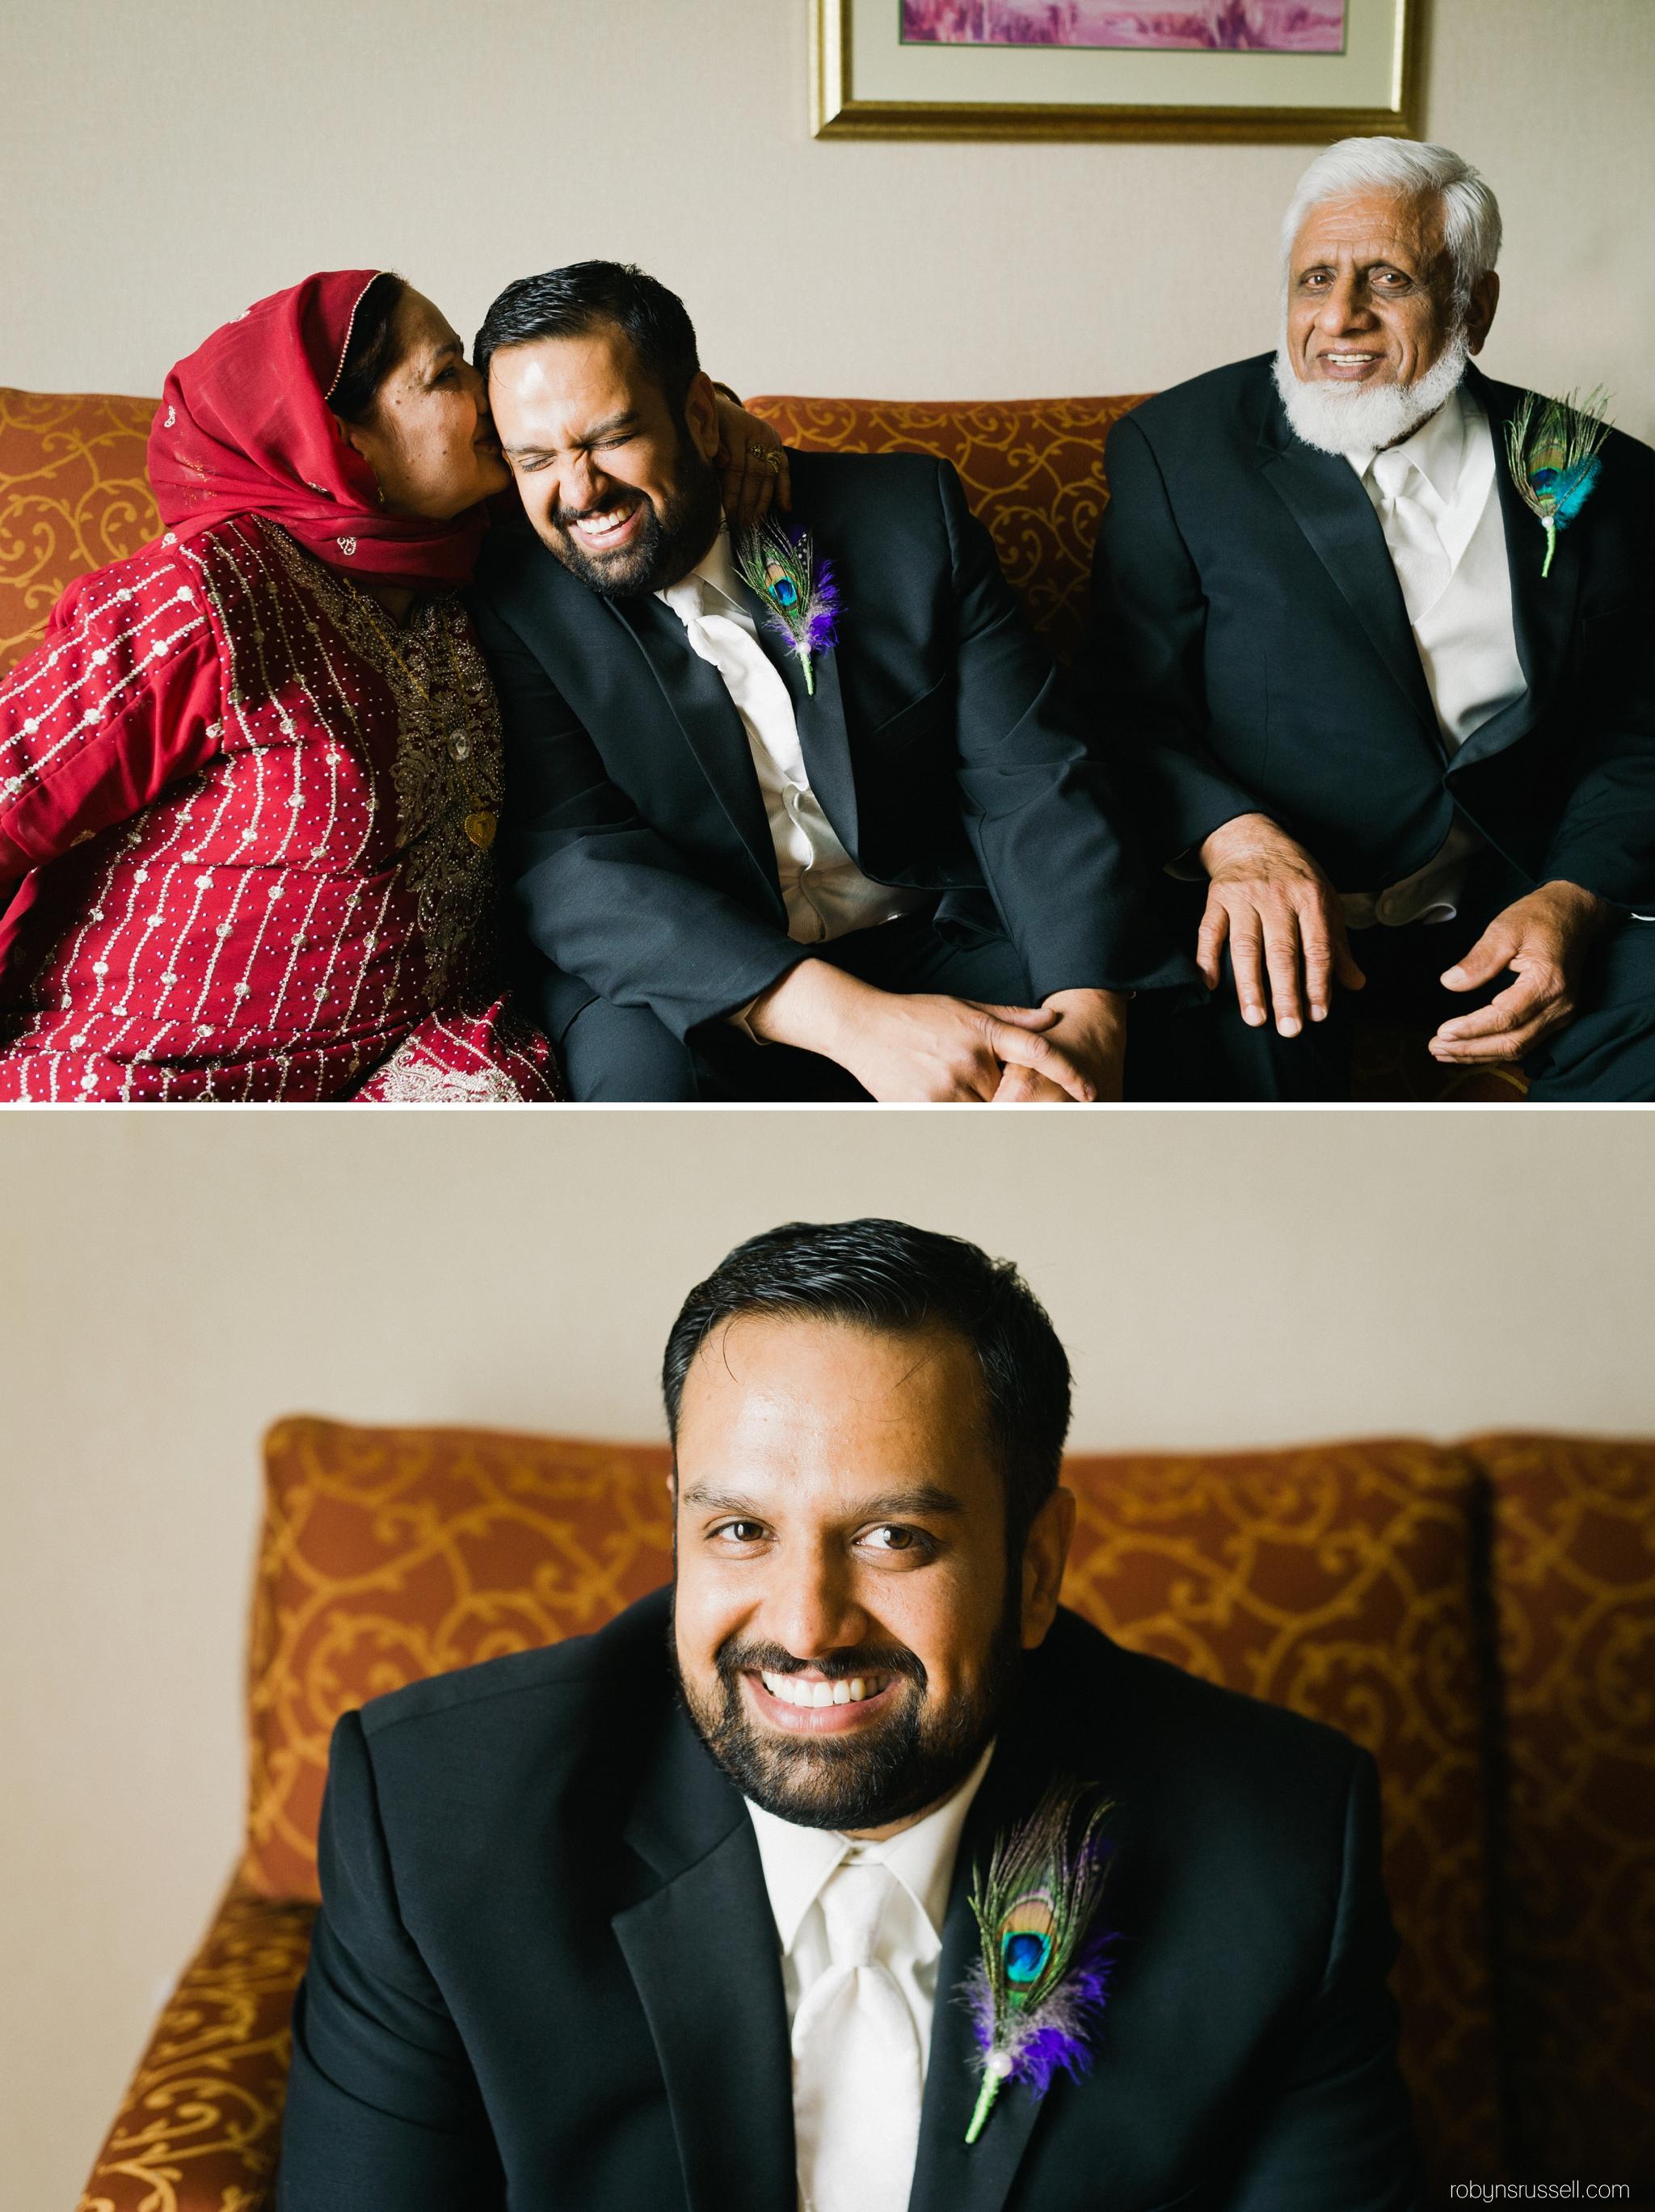 3-groom-with-parents-cambridge-wedding-photographer.jpg